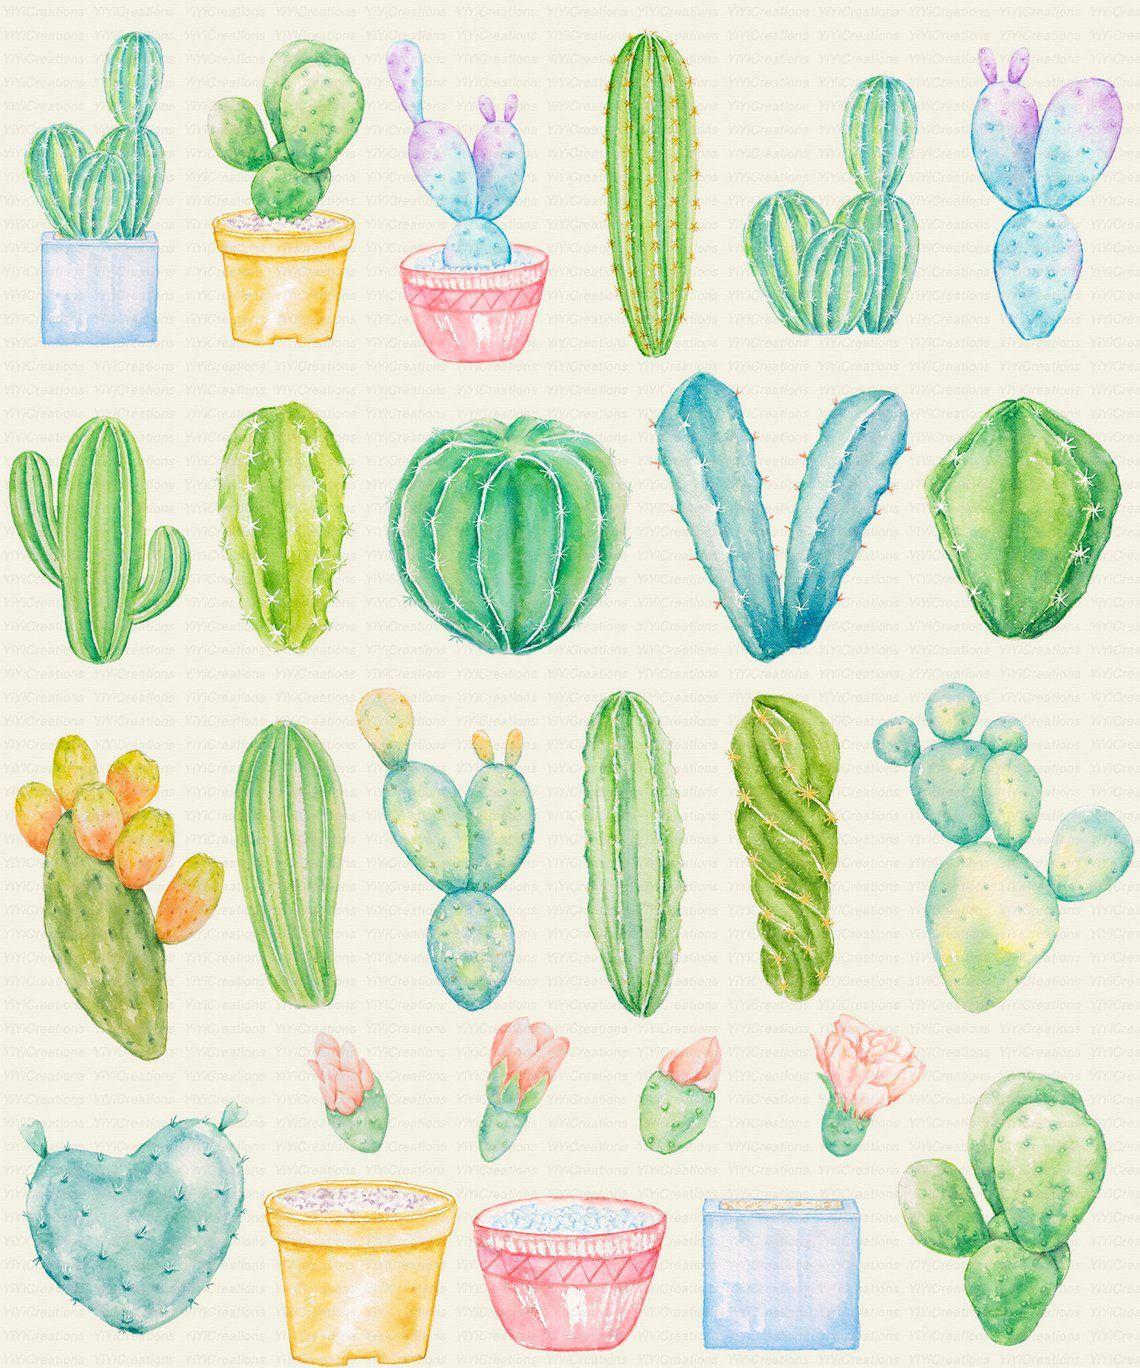 Watercolor Greenish Cactus Clipart Cacti Border Design Tropical